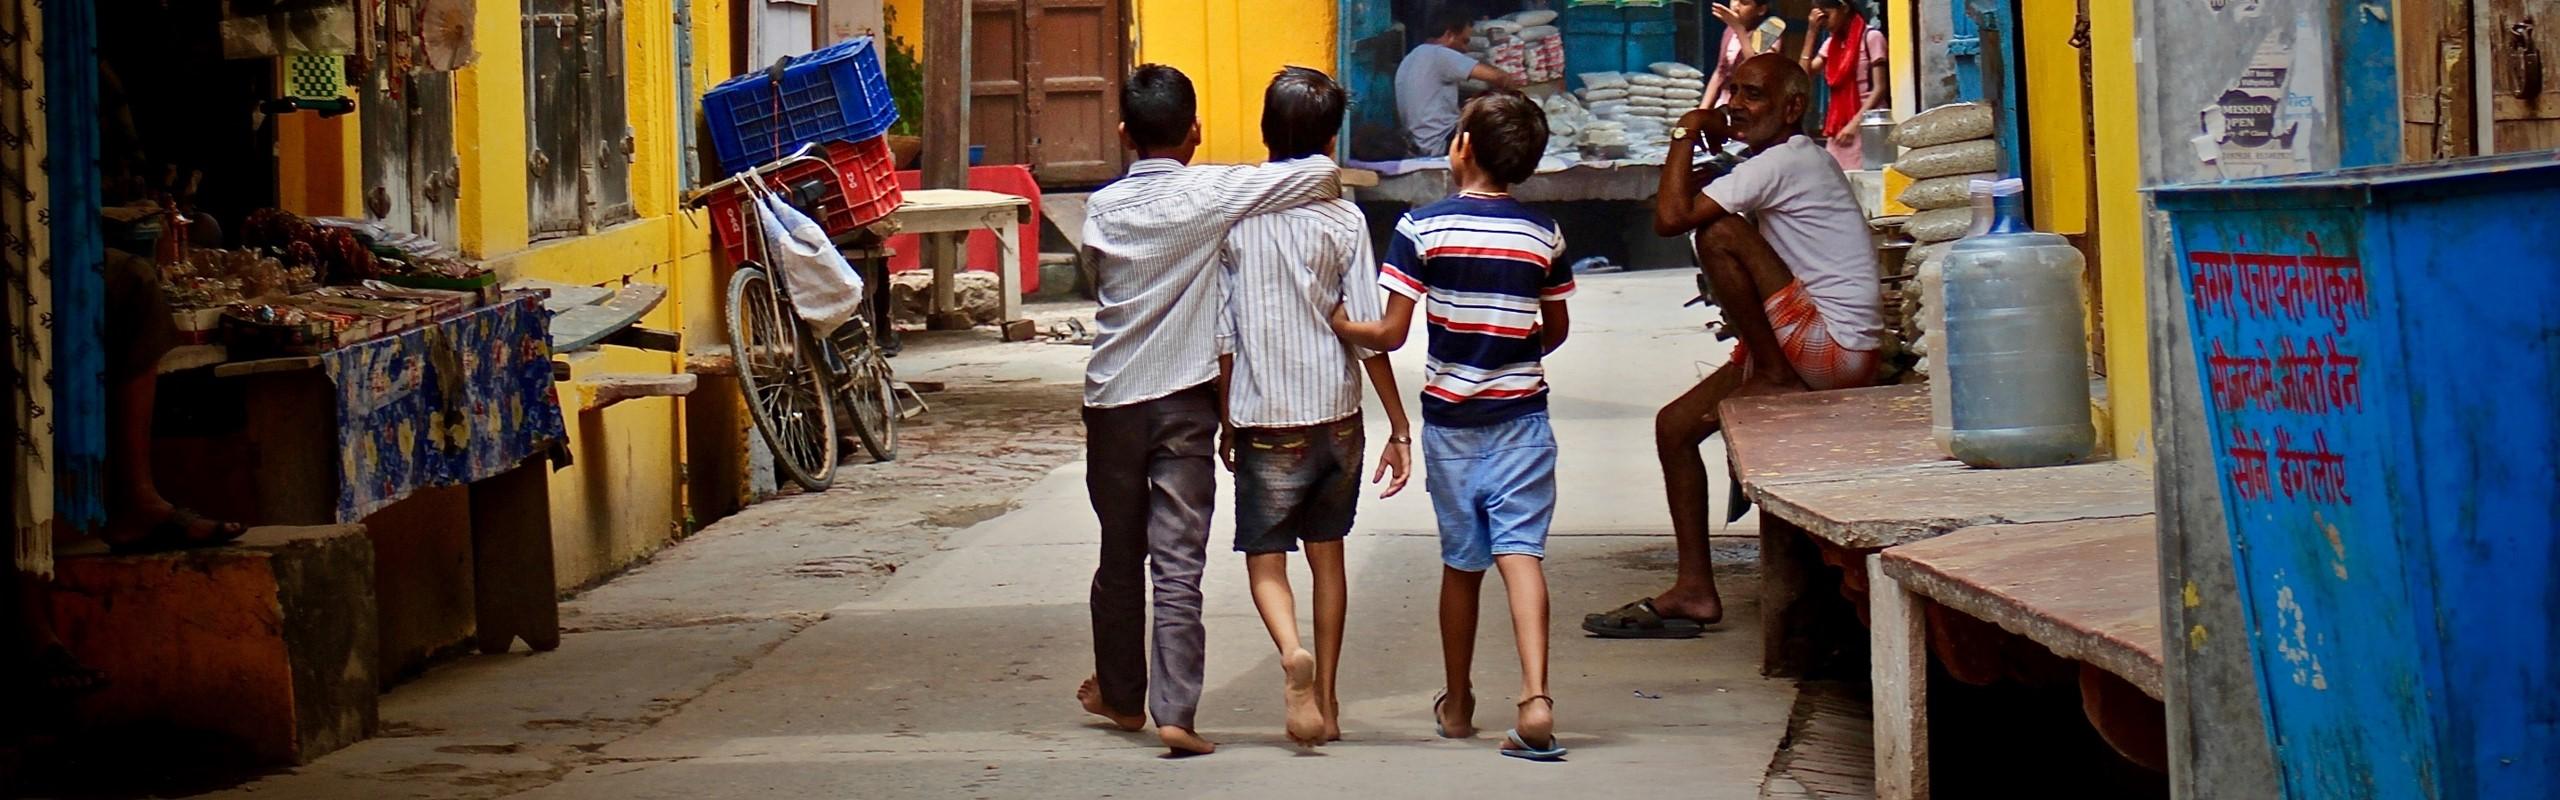 Unsplash: Charur Chaturvedi